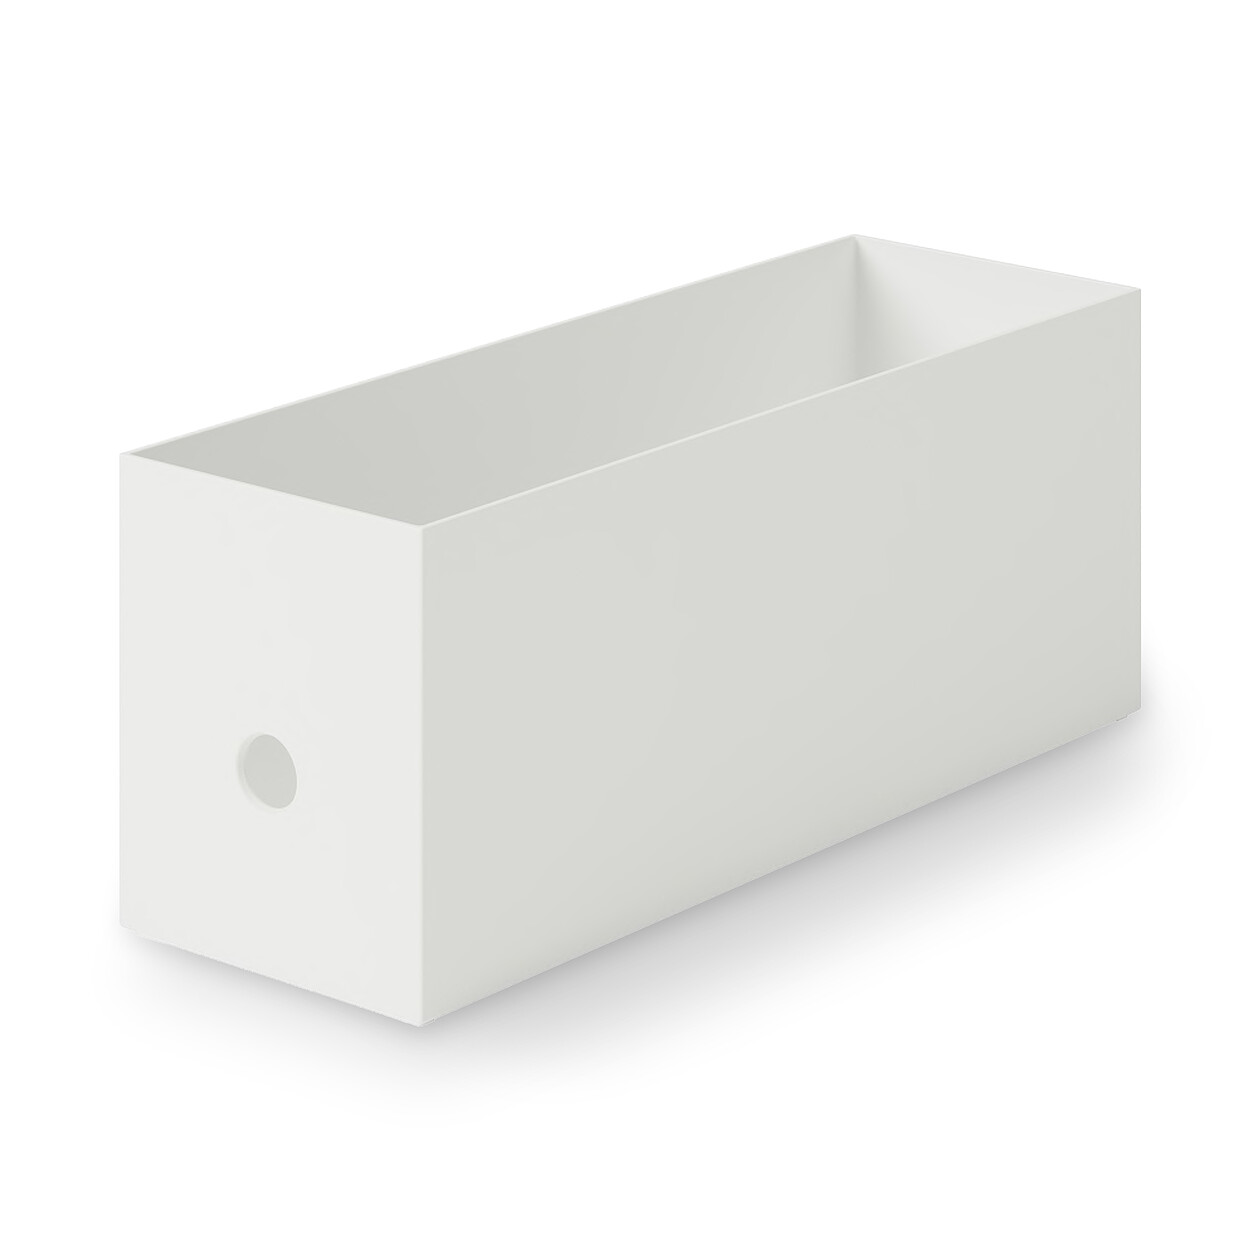 RoomClip商品情報 - ポリプロピレンファイルボックス・スタンダードタイプ・ホワイトグレー・1/2